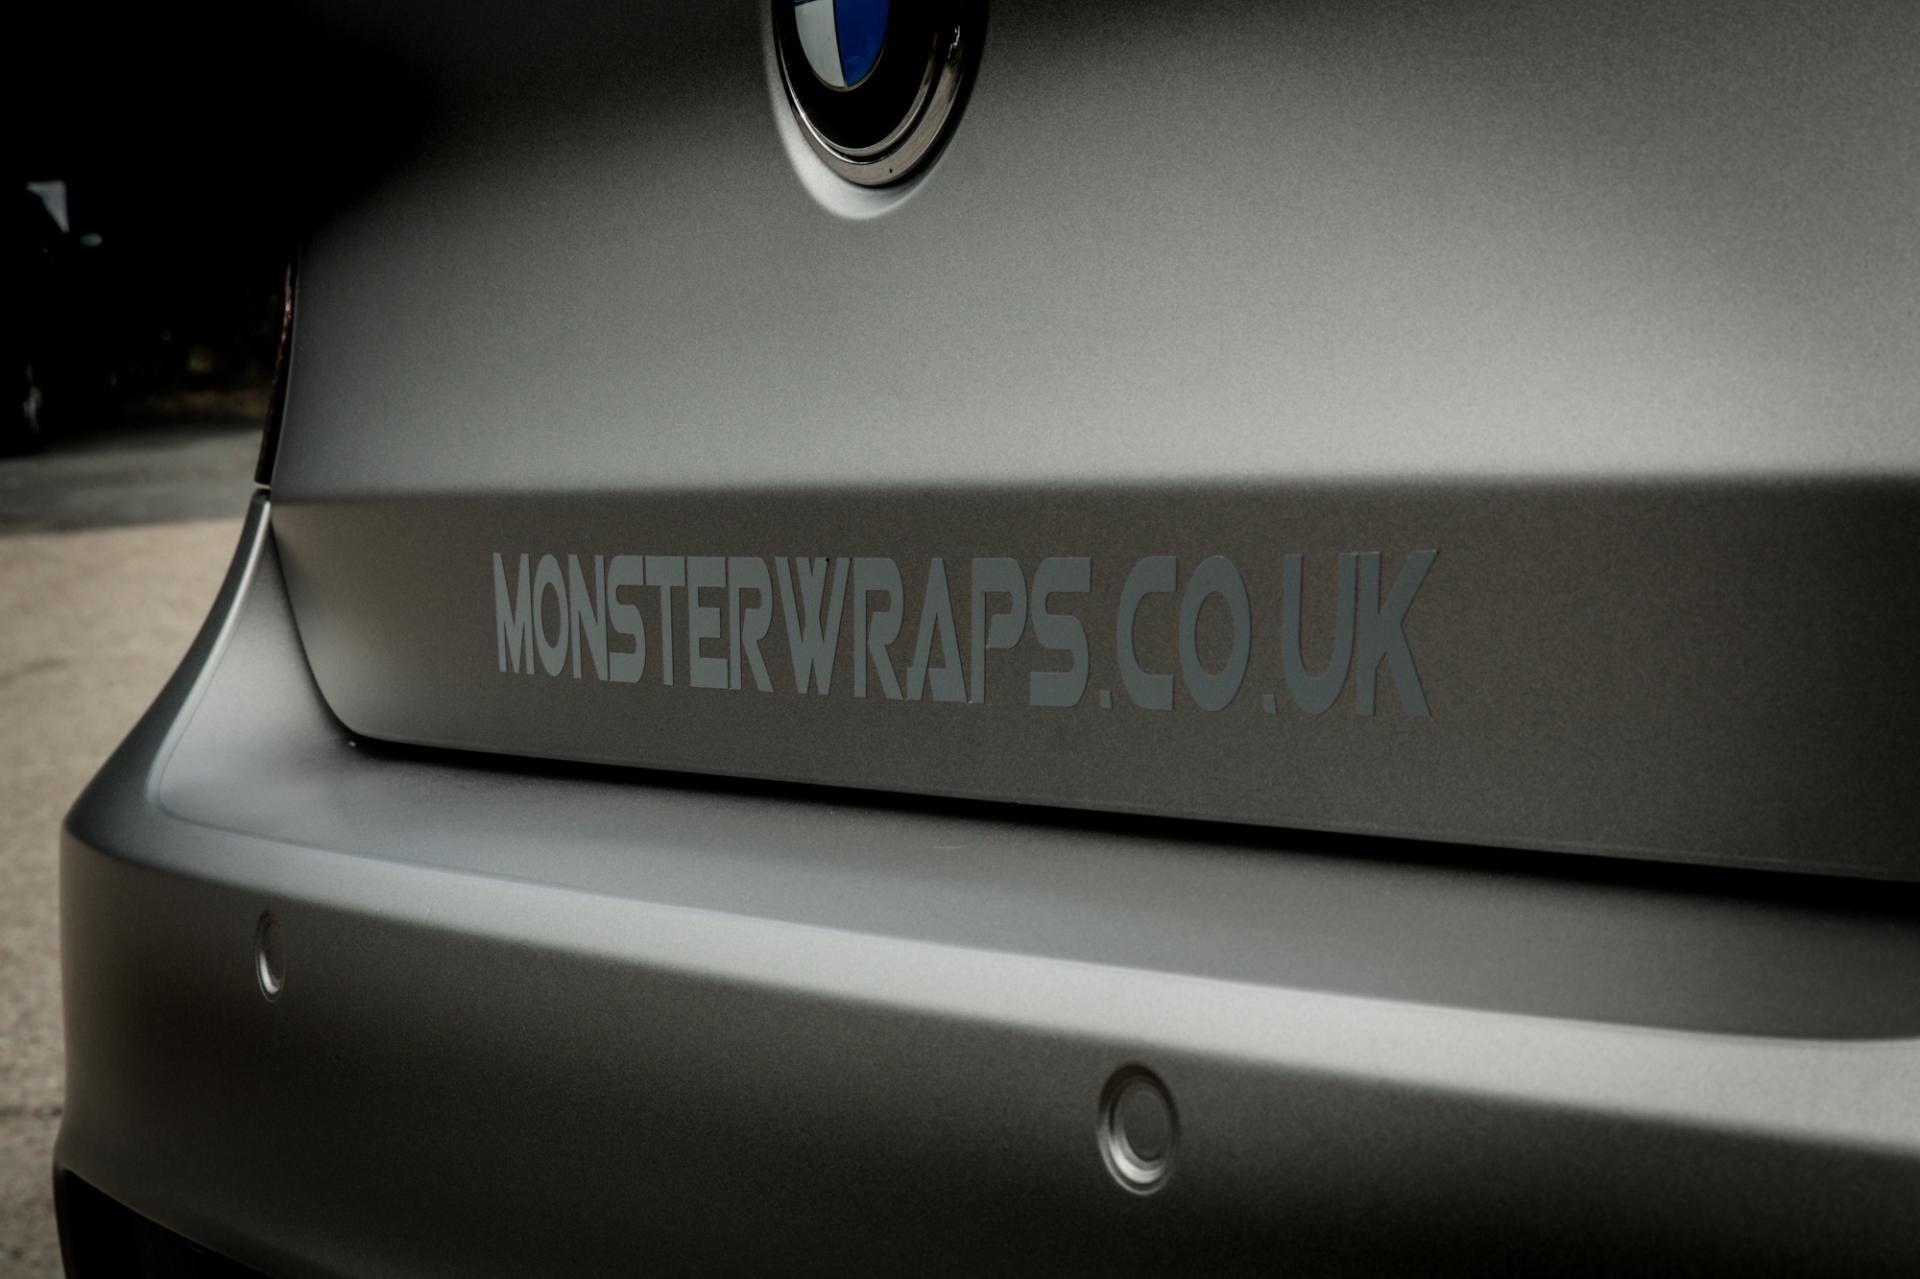 BMW 1 Series E87 Matte grey aluminium wrap 3M monsterwraps